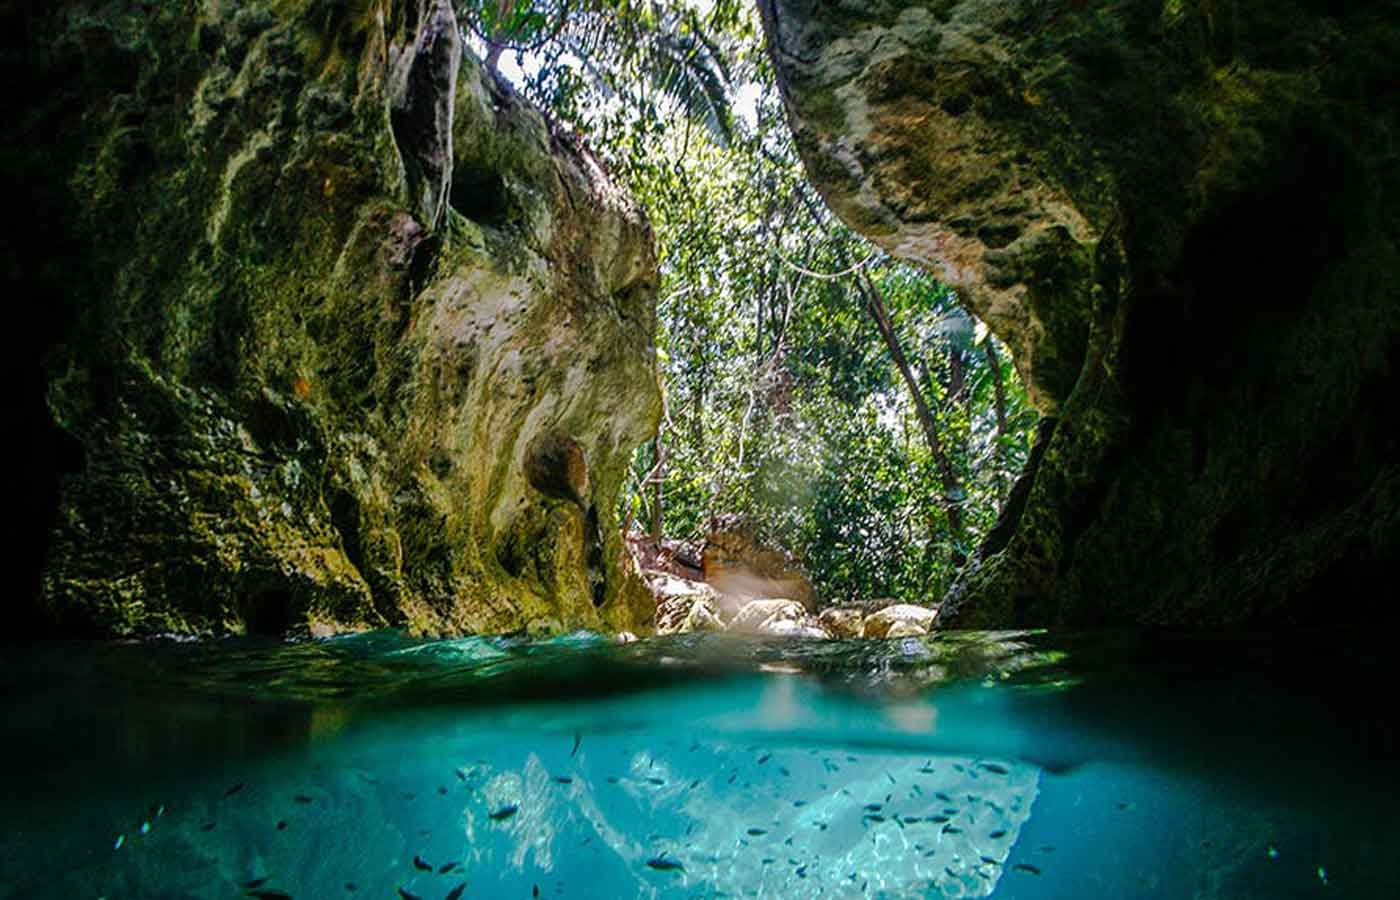 Belize Actun Tunichil Muknal Cave